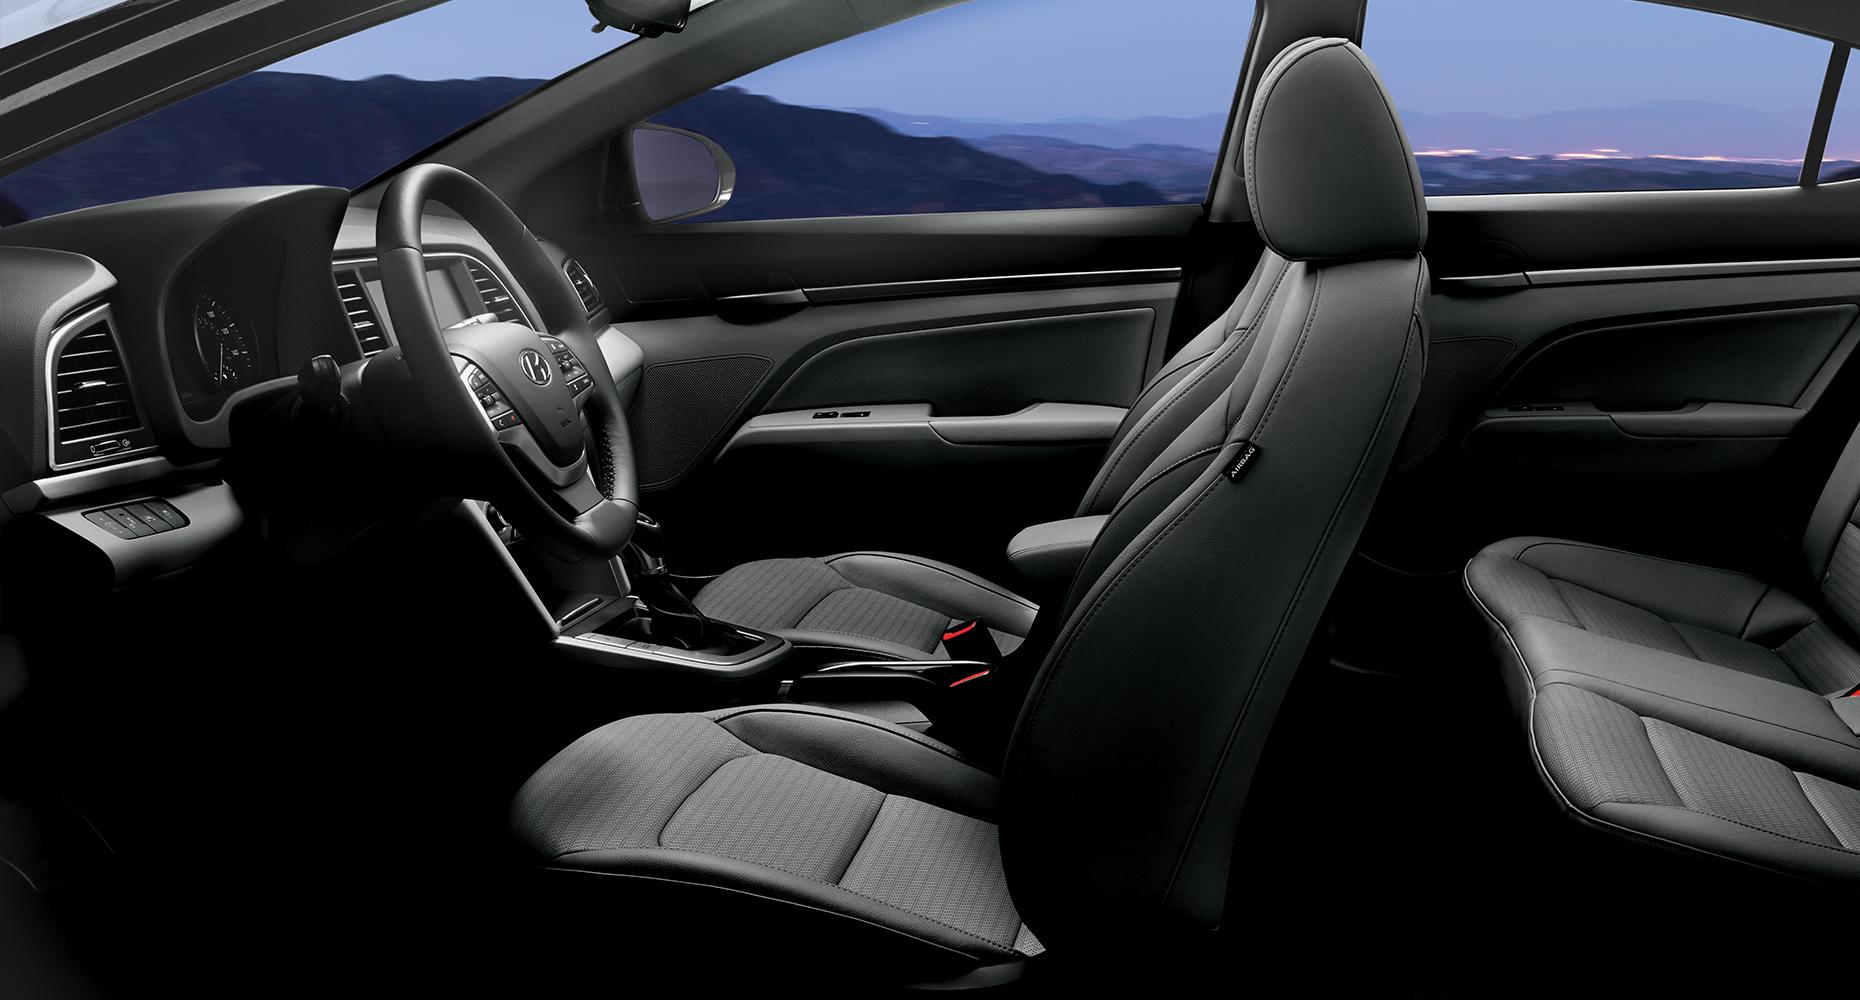 2018 Hyundai Elantra Style Overview